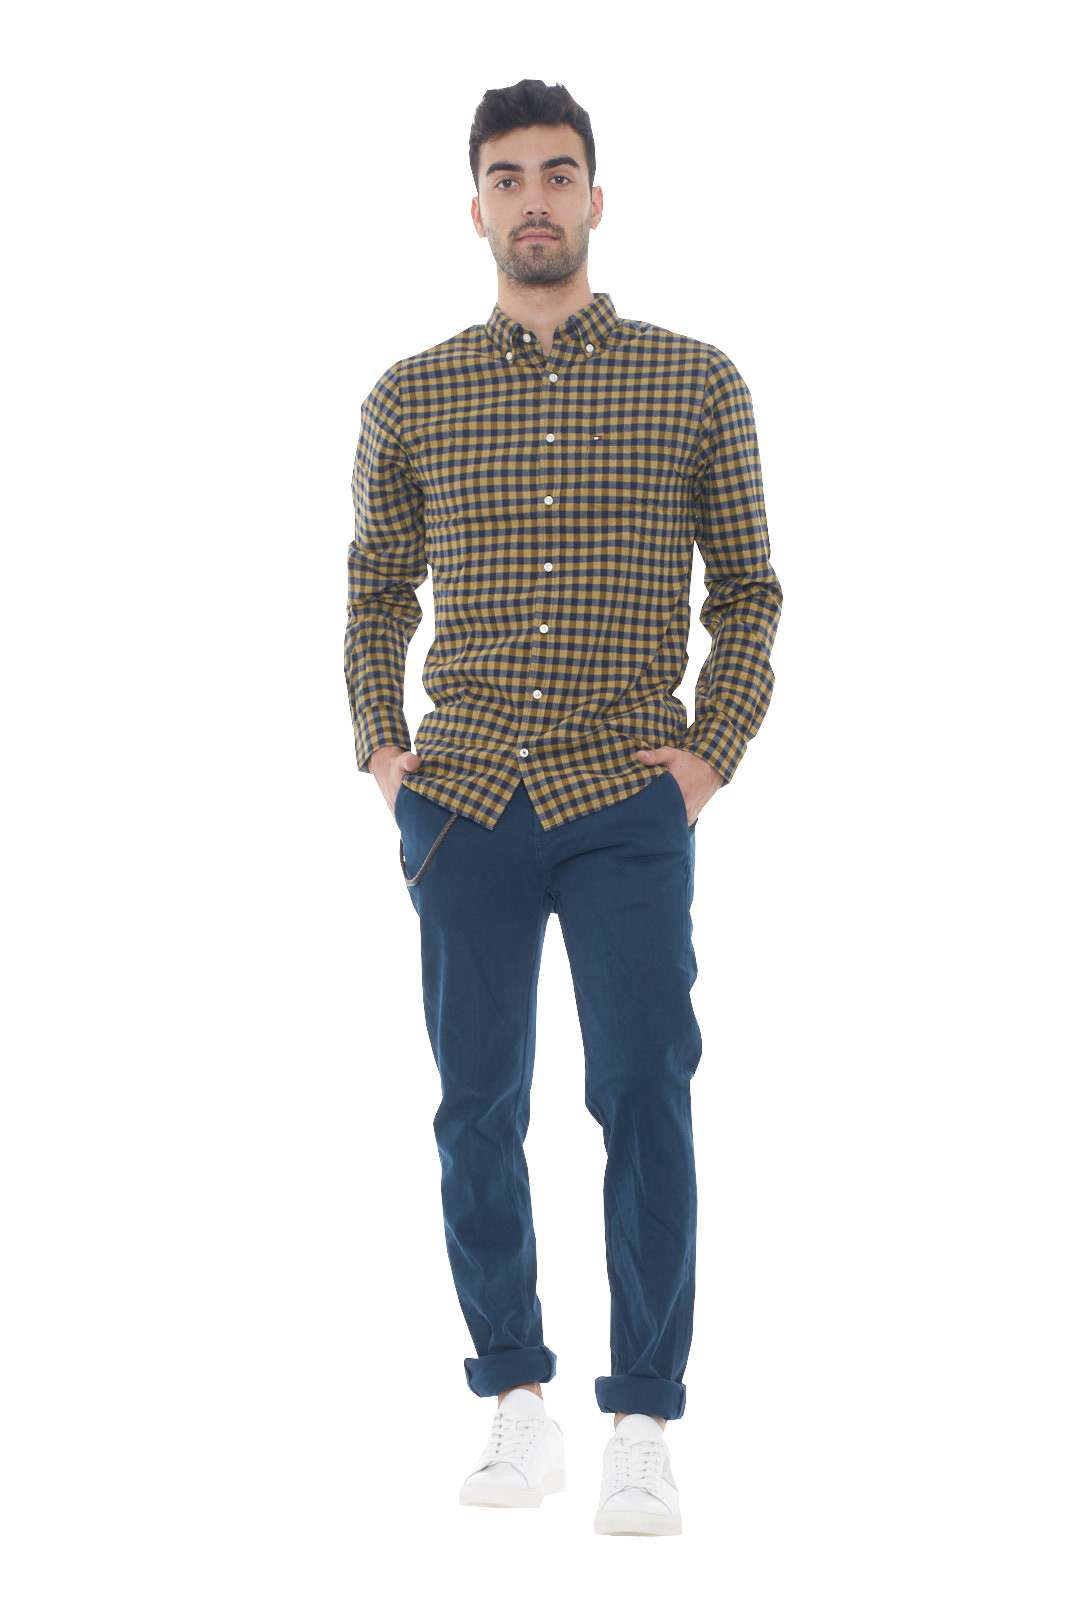 https://www.parmax.com/media/catalog/product/a/i/AI-outlet_parmax-pantaloni-uomo-Tramarossa-ROBERT-D_1.jpg